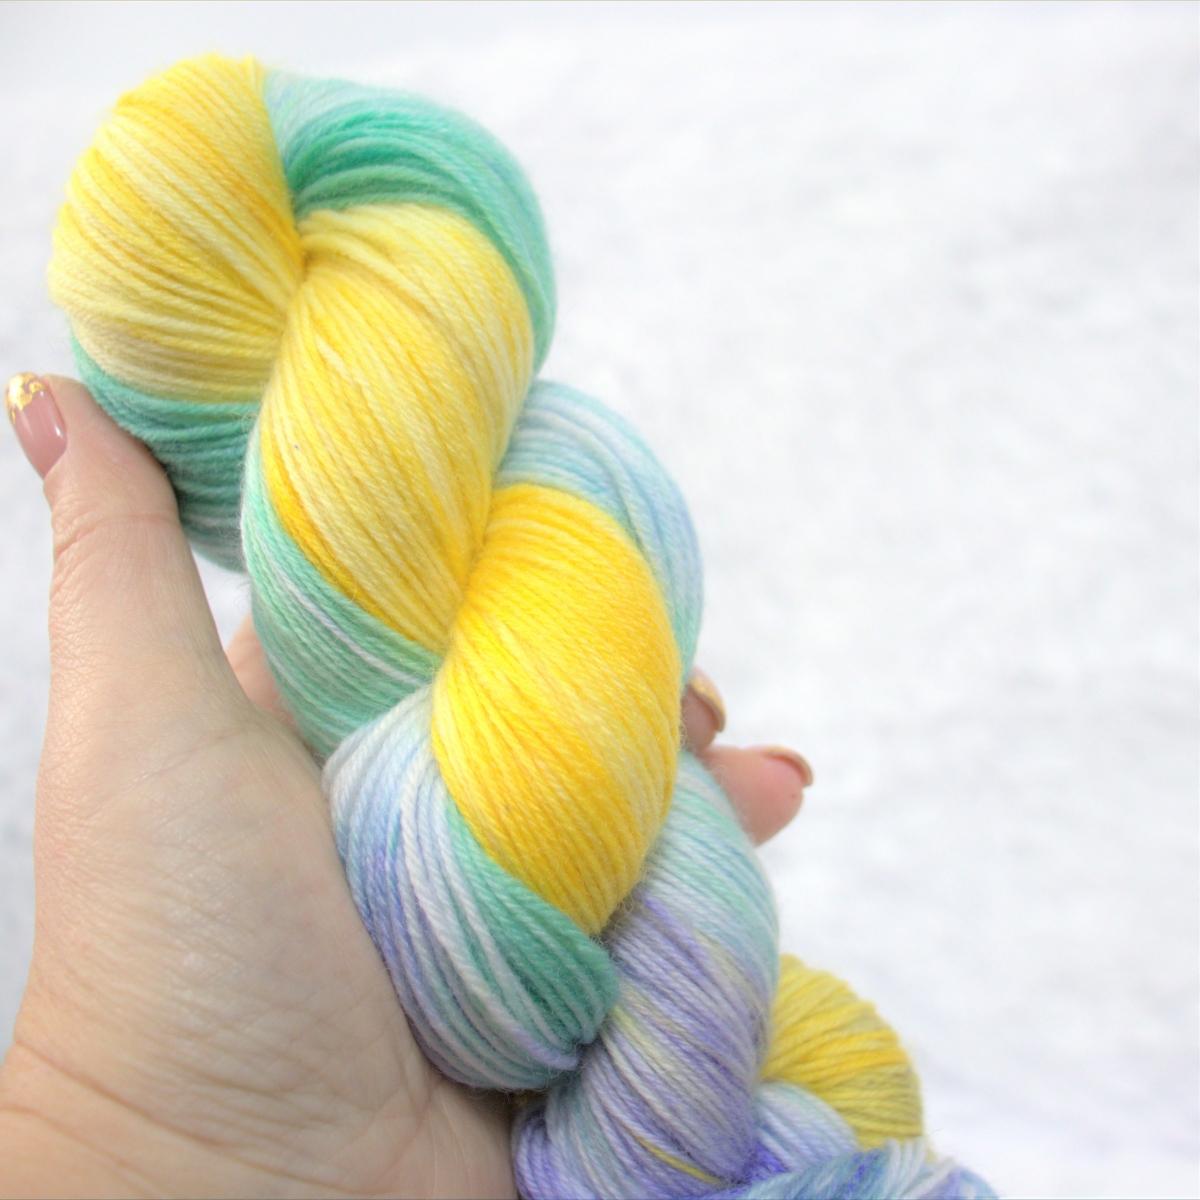 woodico.pro hand dyed yarn 046 1200x1200 - Hand dyed yarn / 046